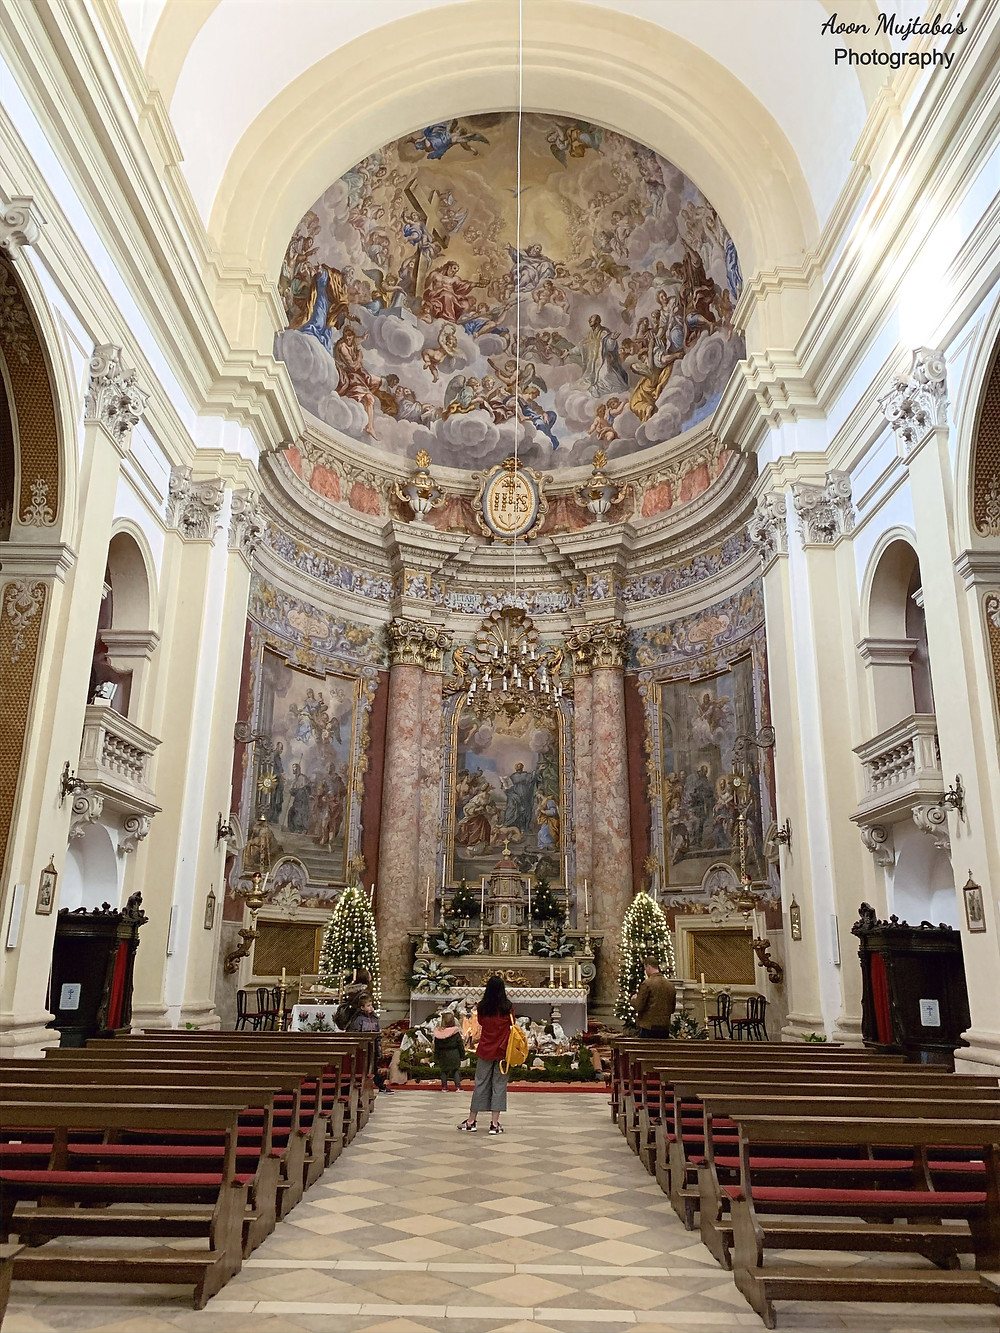 Franciscan Monastery in Dubrovnik, Croatia